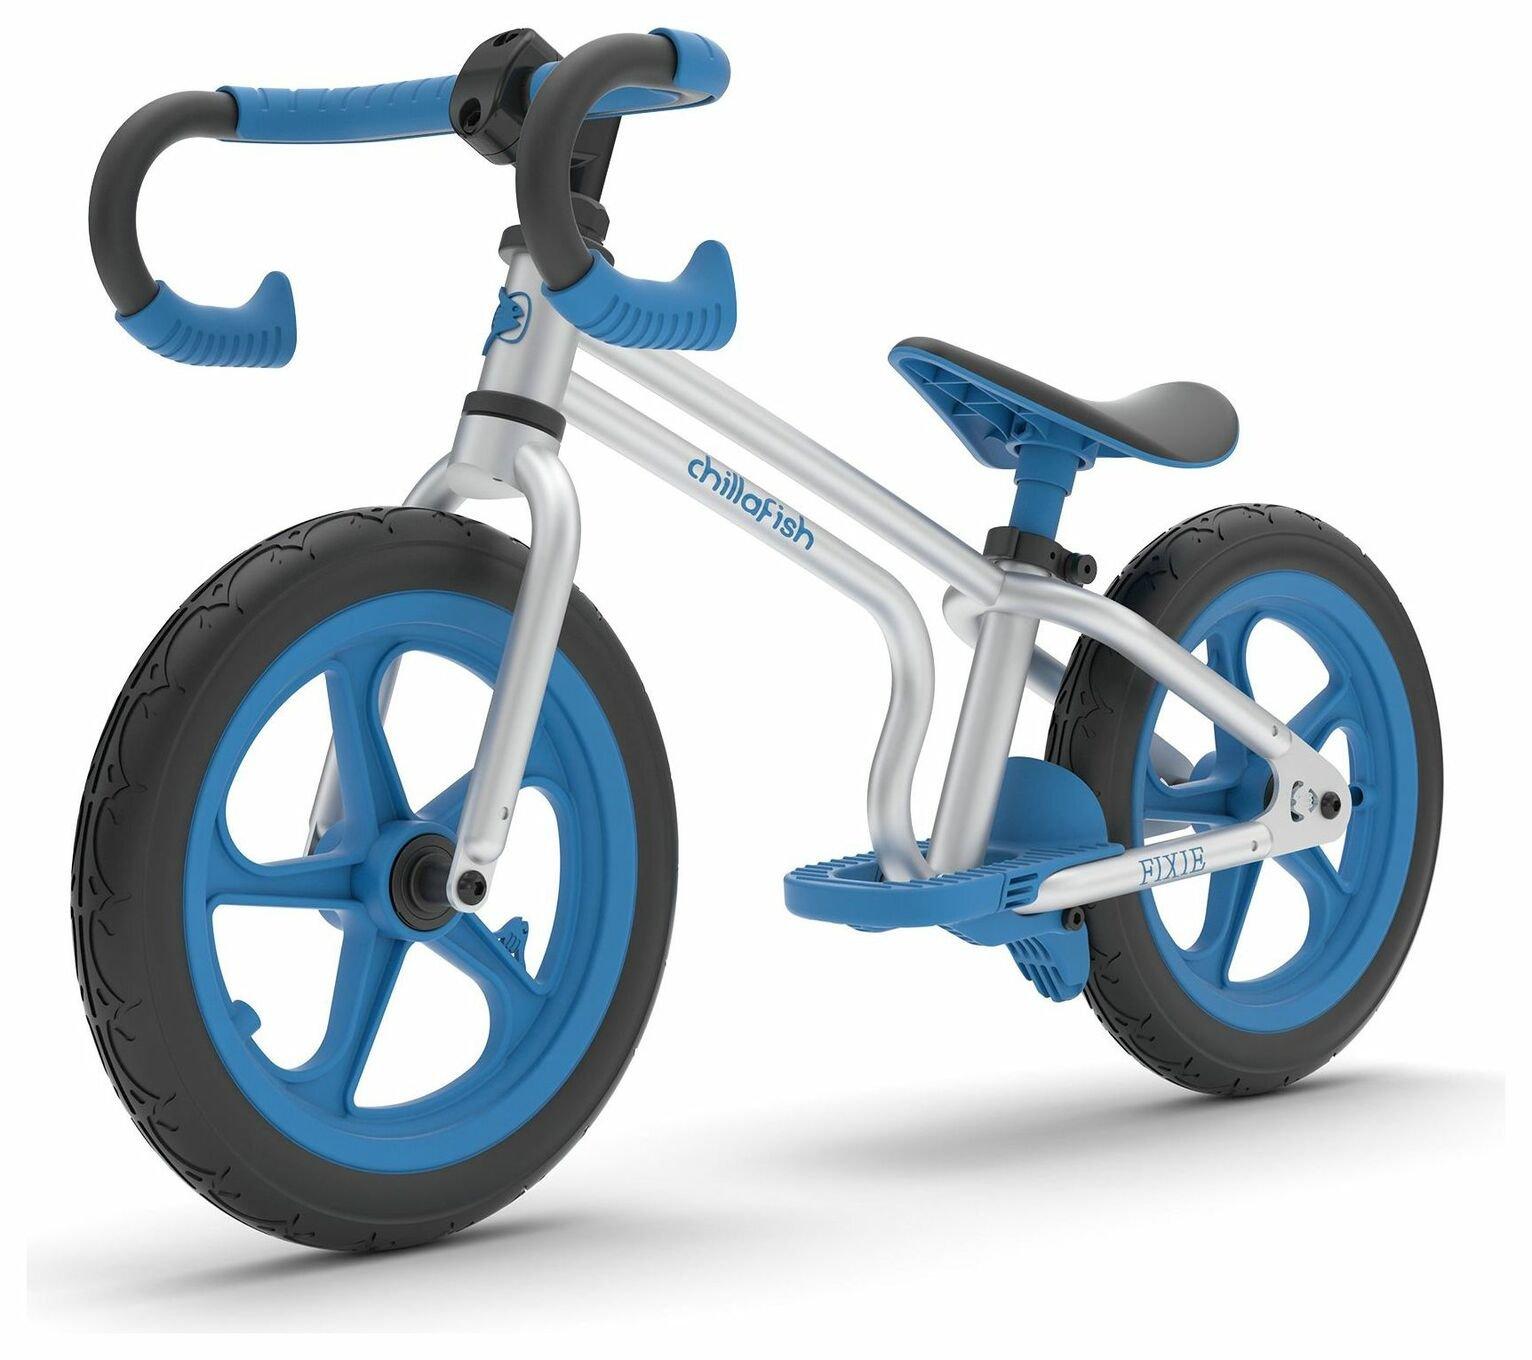 Chillafish Fixie Balance Bike - Blue